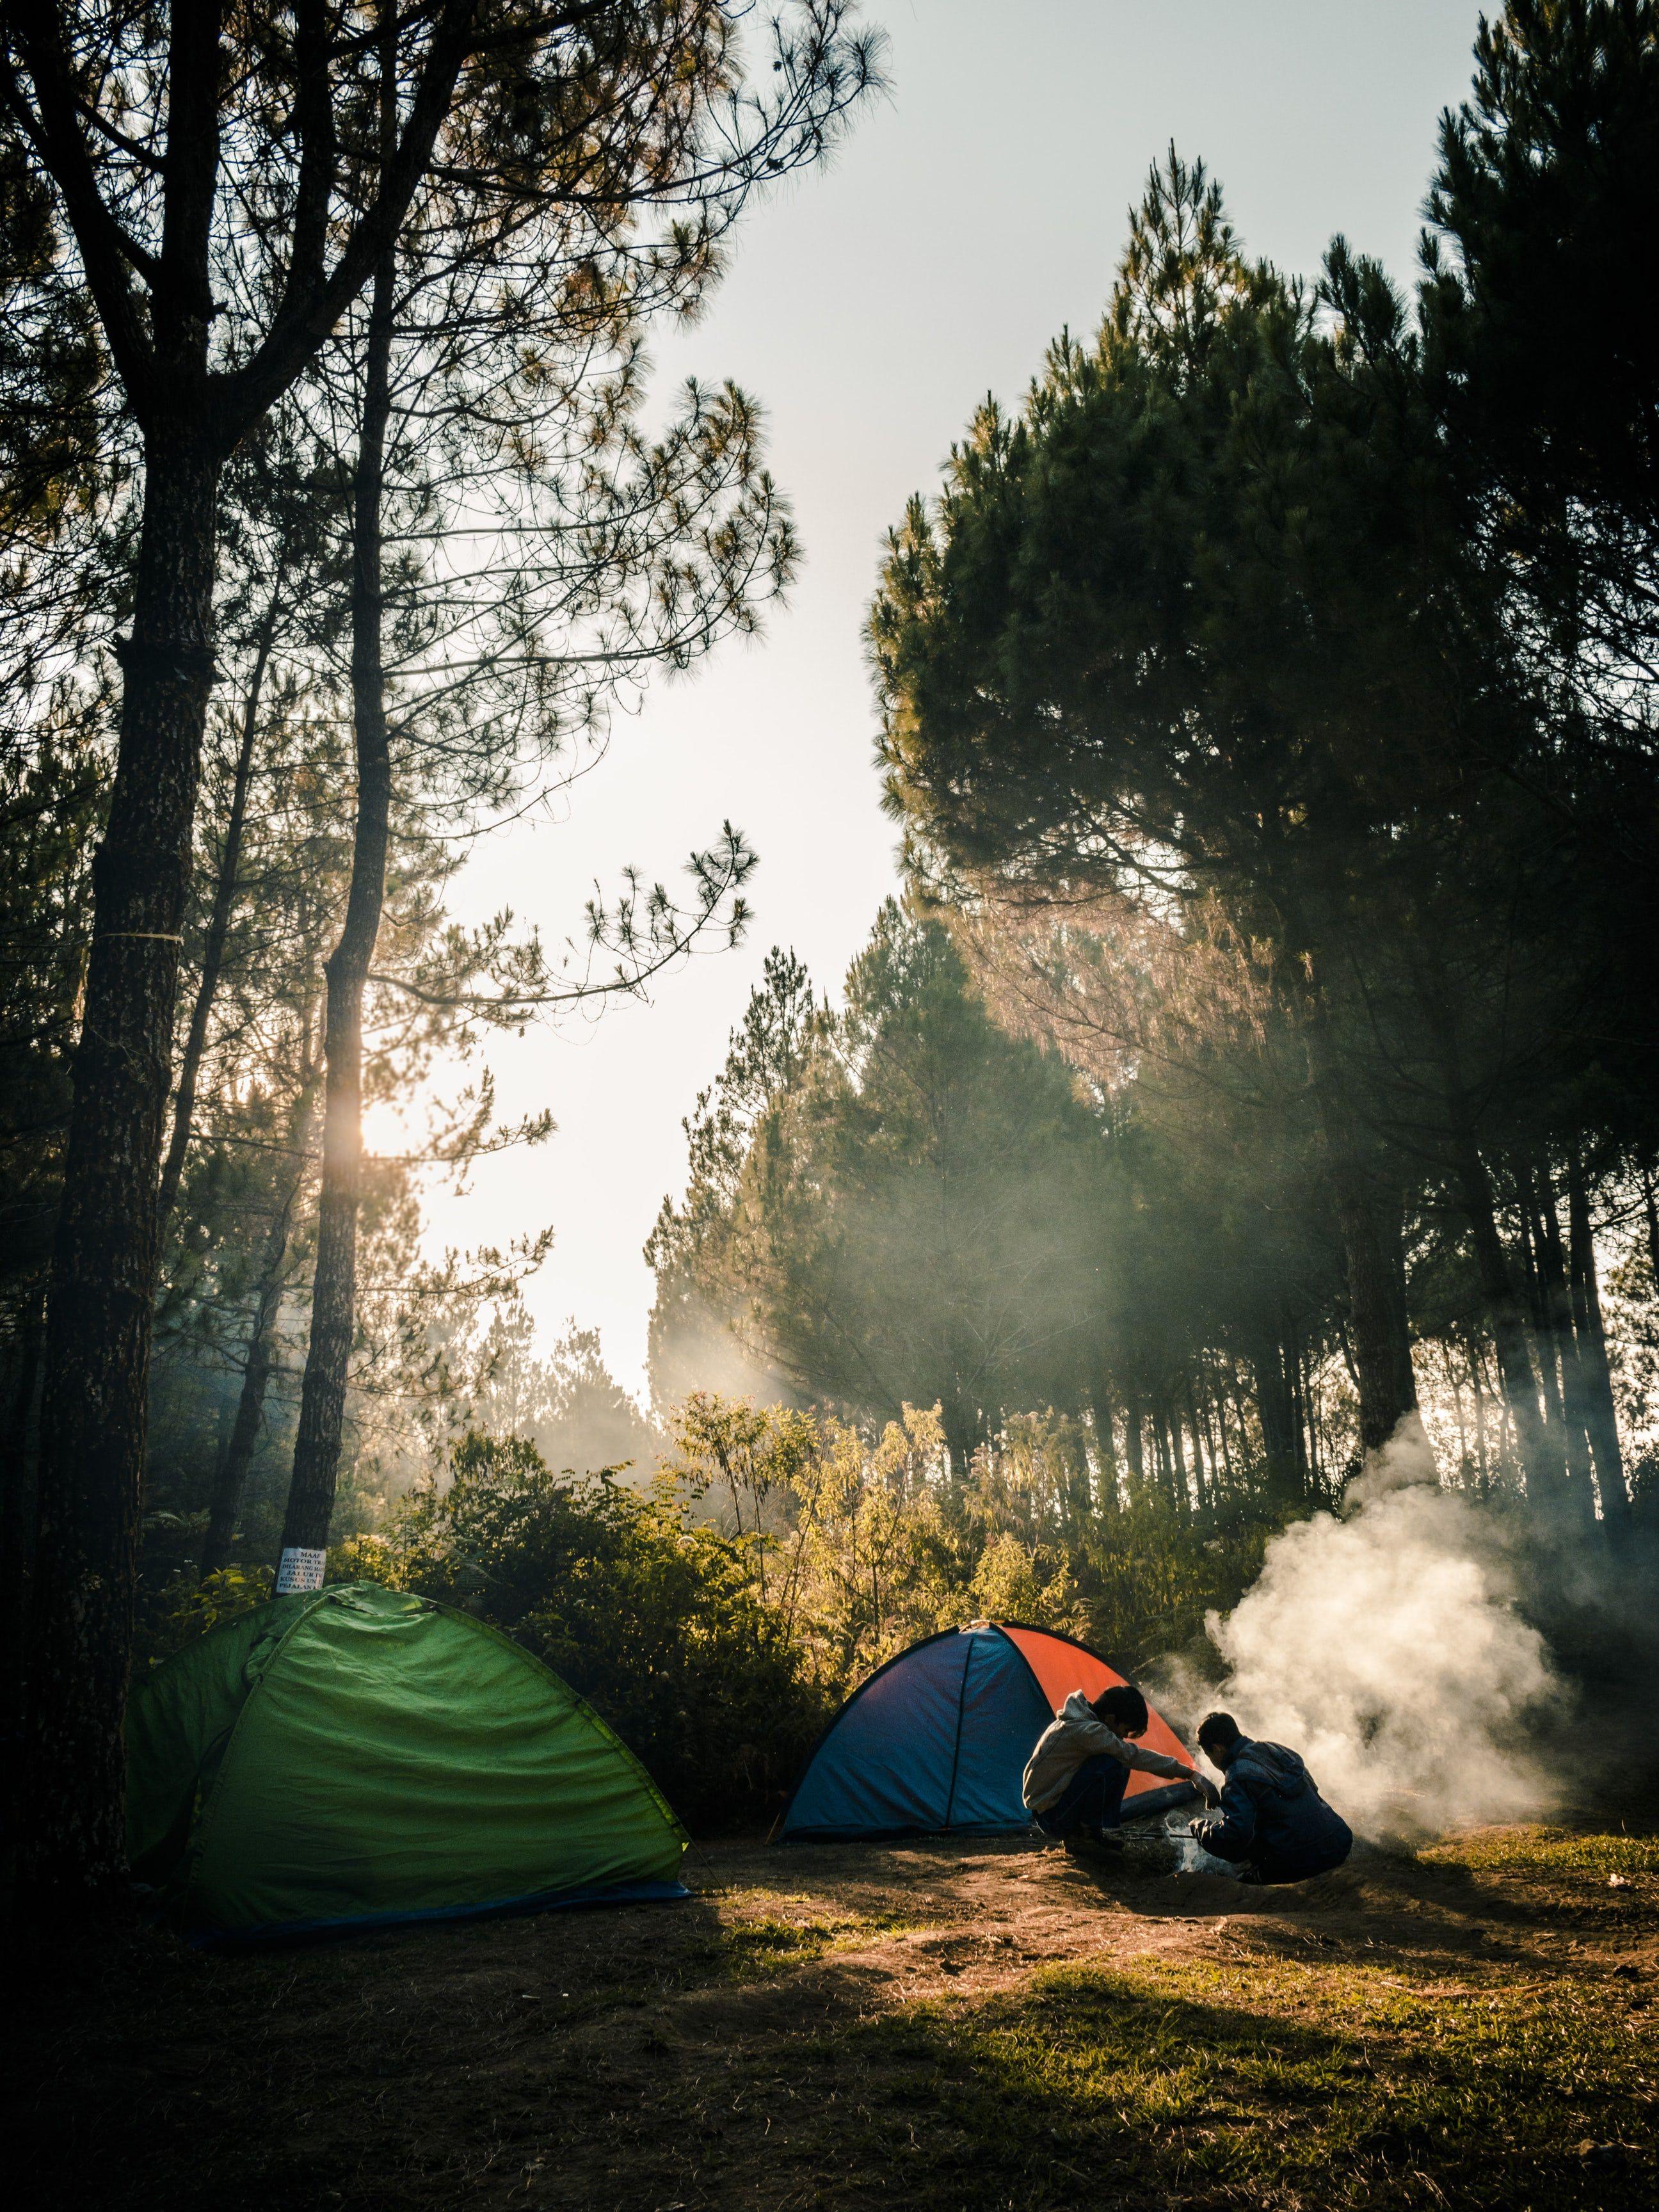 Camp Car Pictures Download Free Images on Unsplash